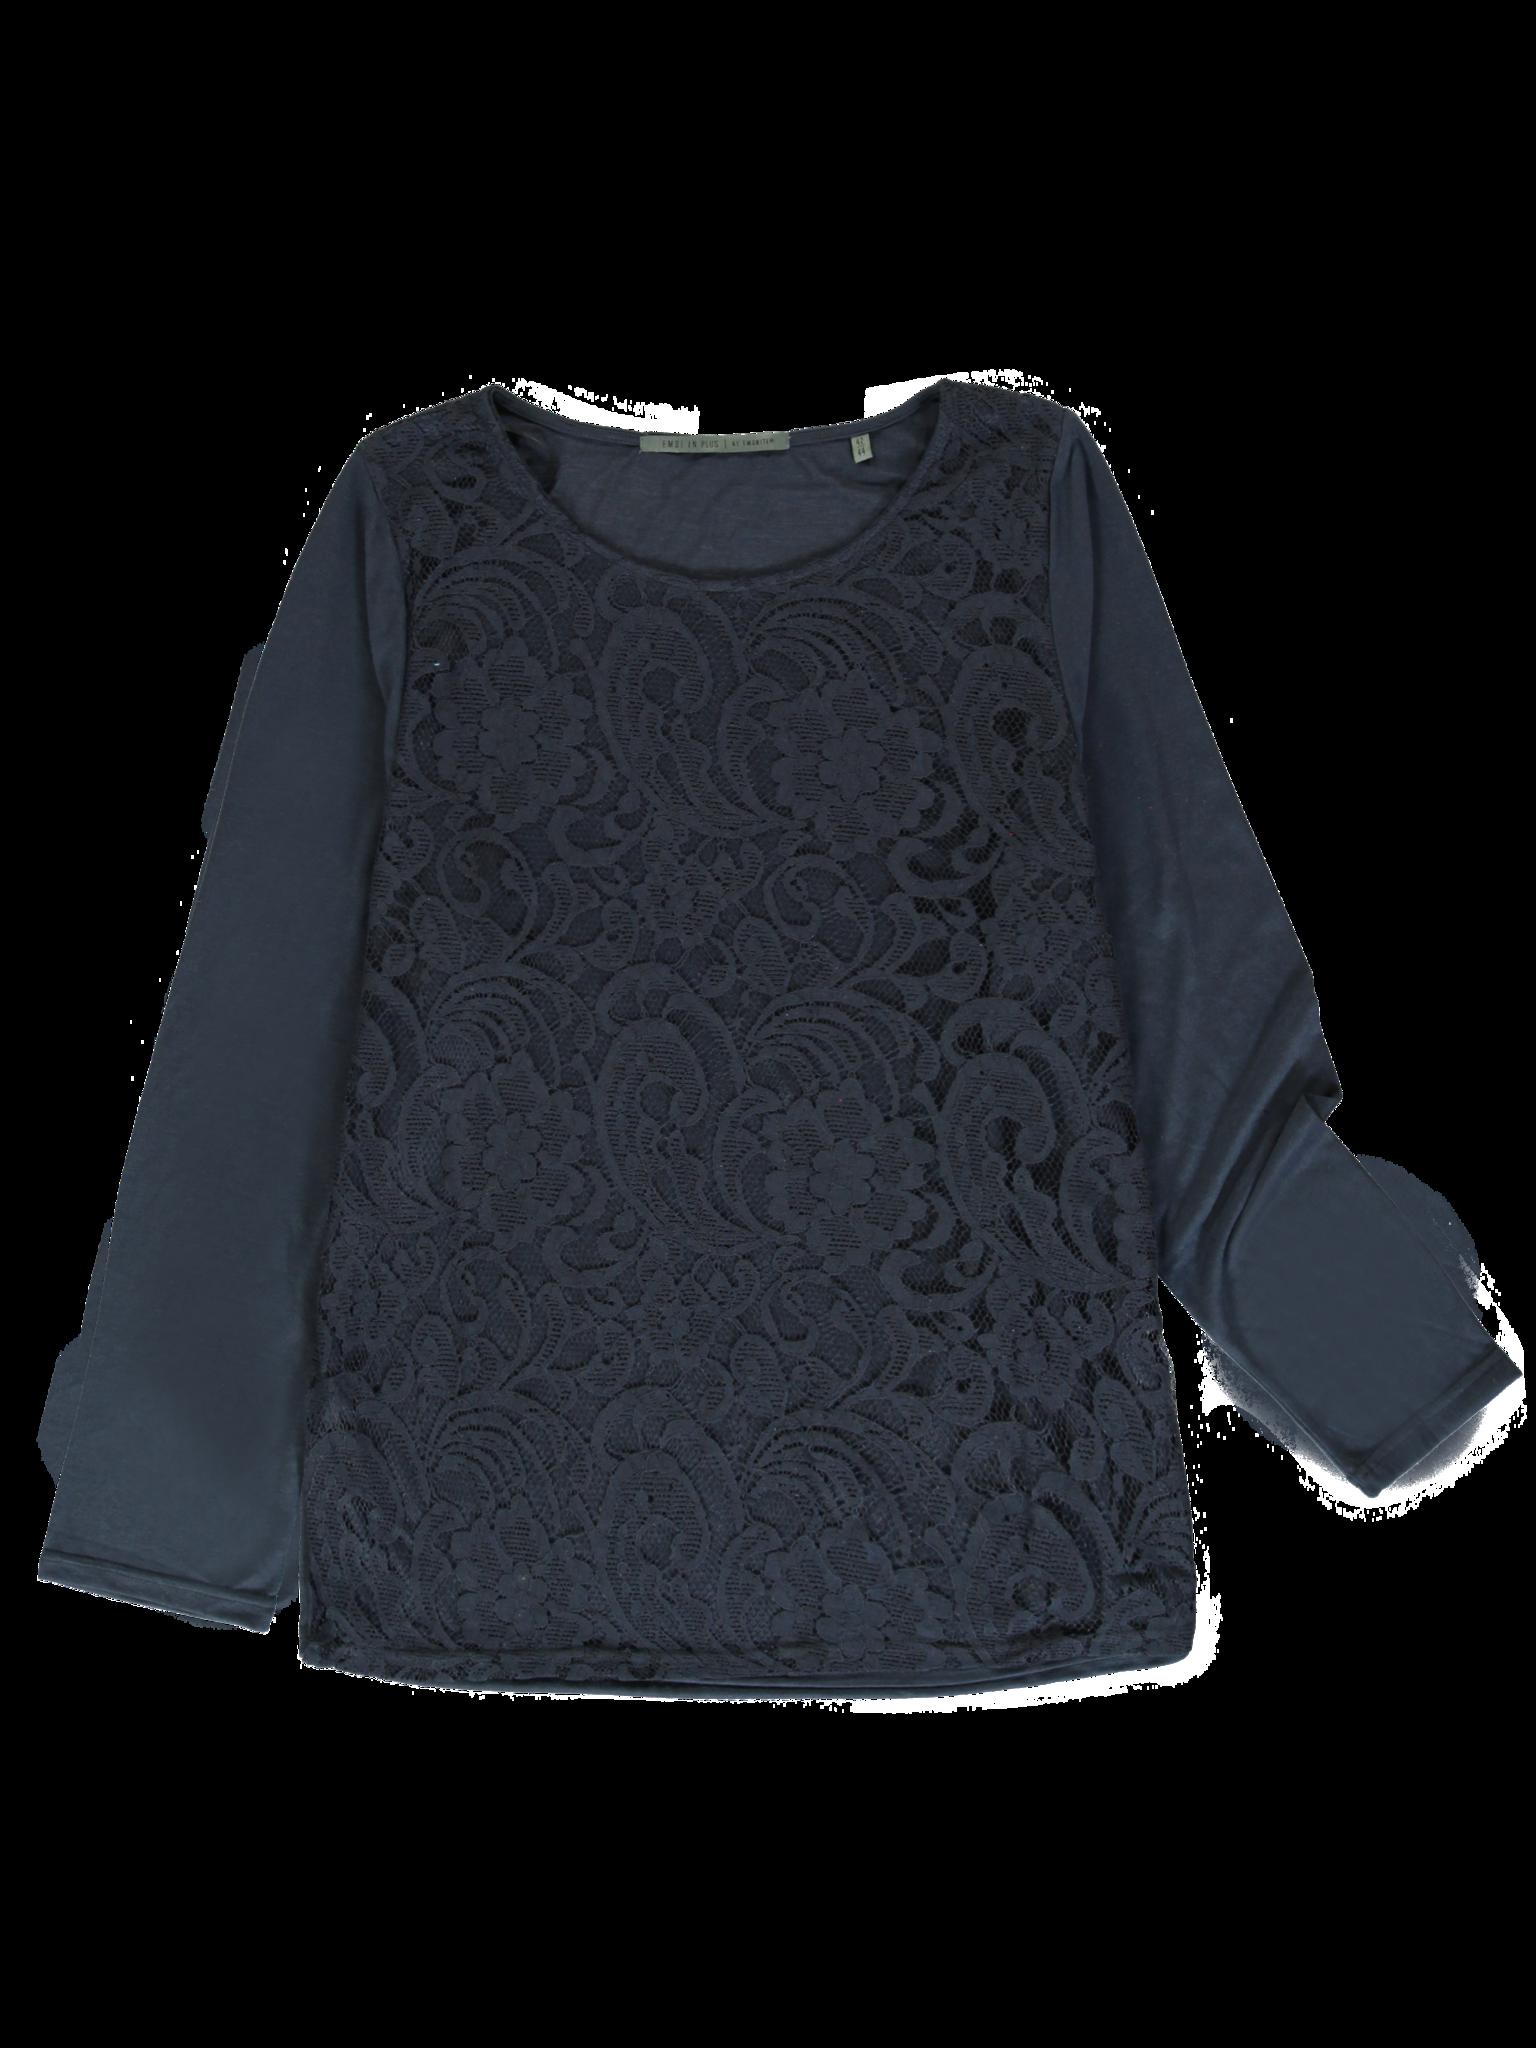 All Brands | Winterproducts Ladies+ | T-shirt | 18 pcs/box